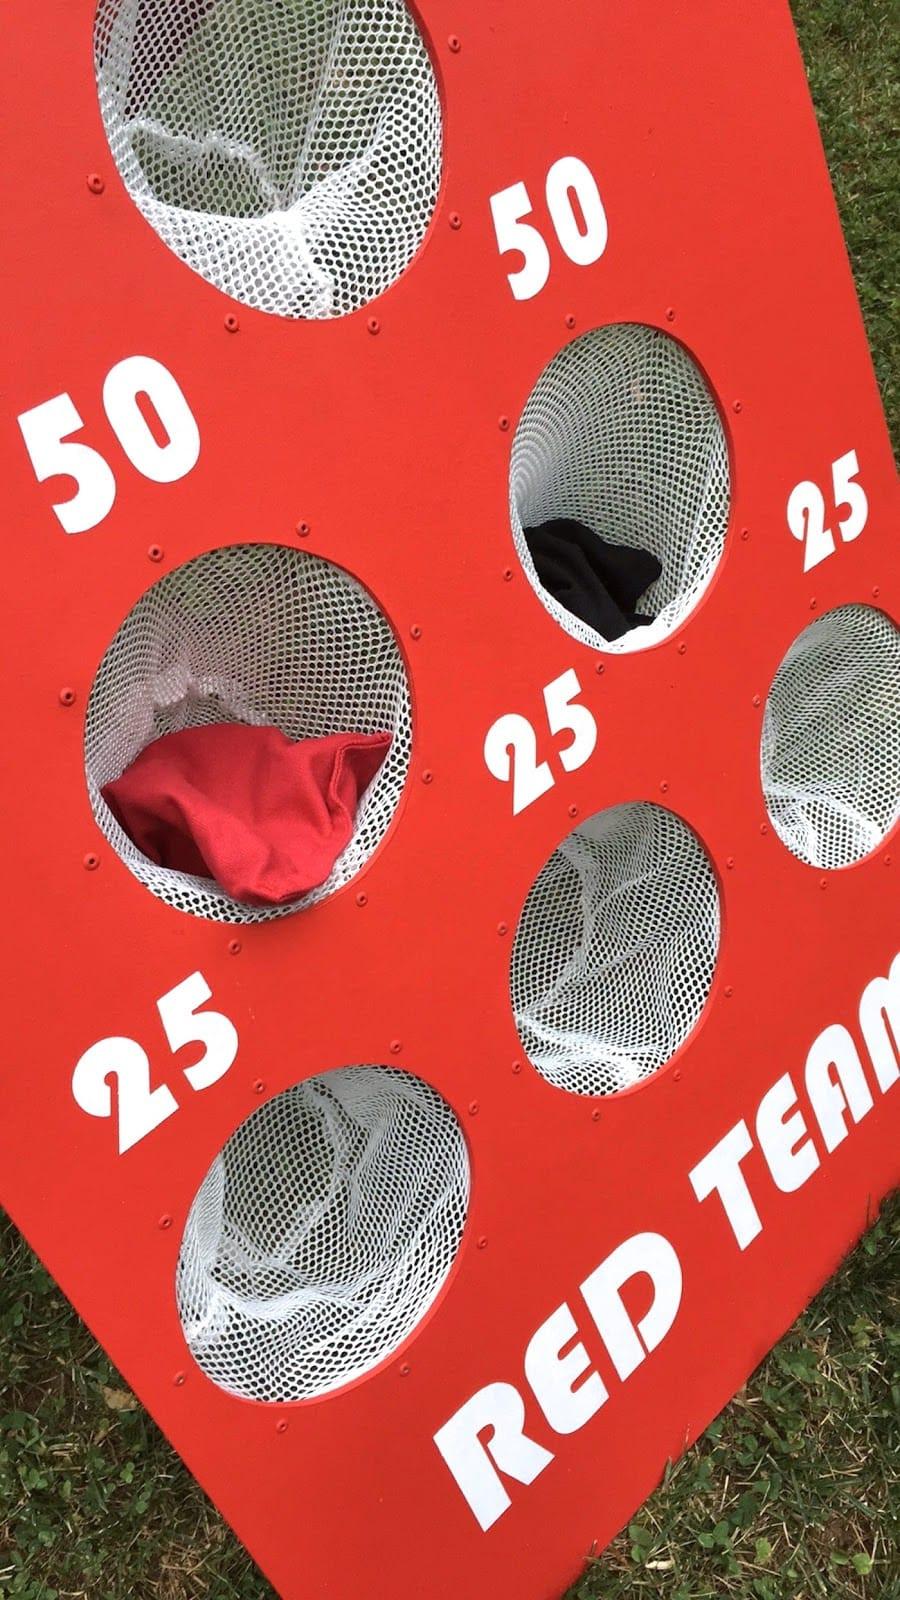 Best ideas about DIY Bean Bag Toss . Save or Pin How to Make a DIY Backyard Bean Bag Toss Game Now.